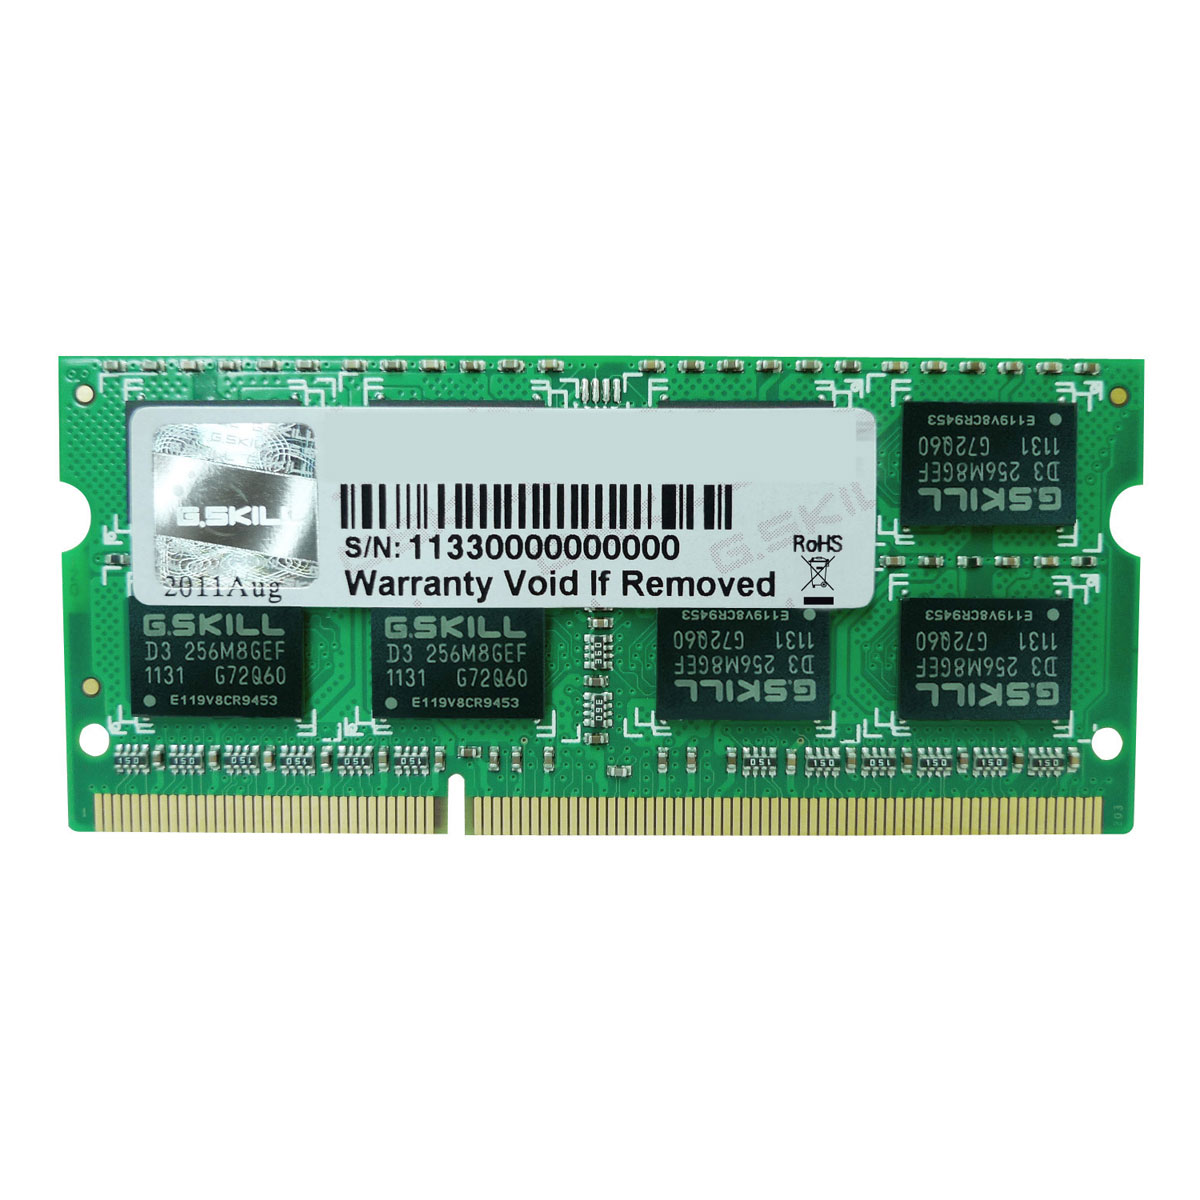 Mémoire PC portable G.Skill SO-DIMM 4 Go DDR3 1600 MHz CL11 RAM SO-DIMM PC3-12800 - F3-1600C11S-4GSL (garantie à vie par G.Skill)